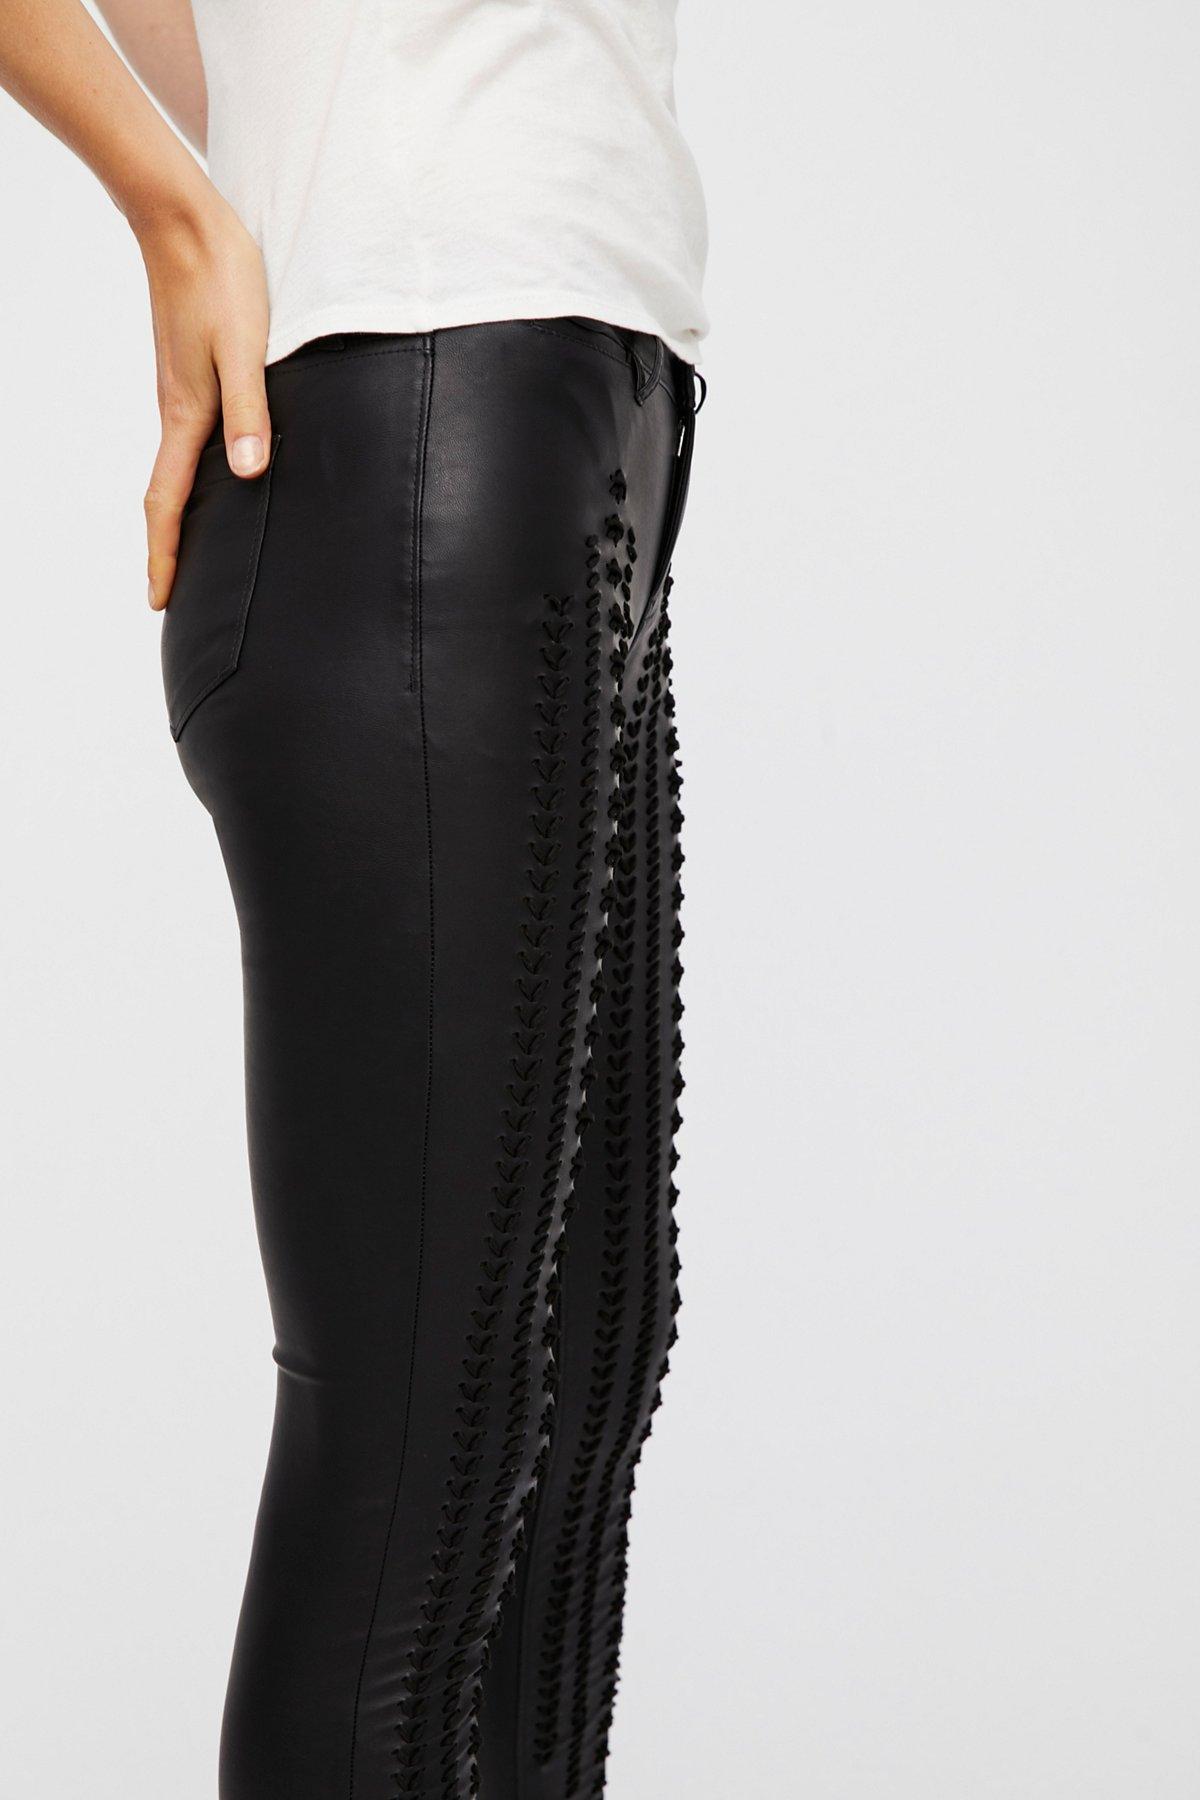 Vegan Leather Lattice Skinny Pants